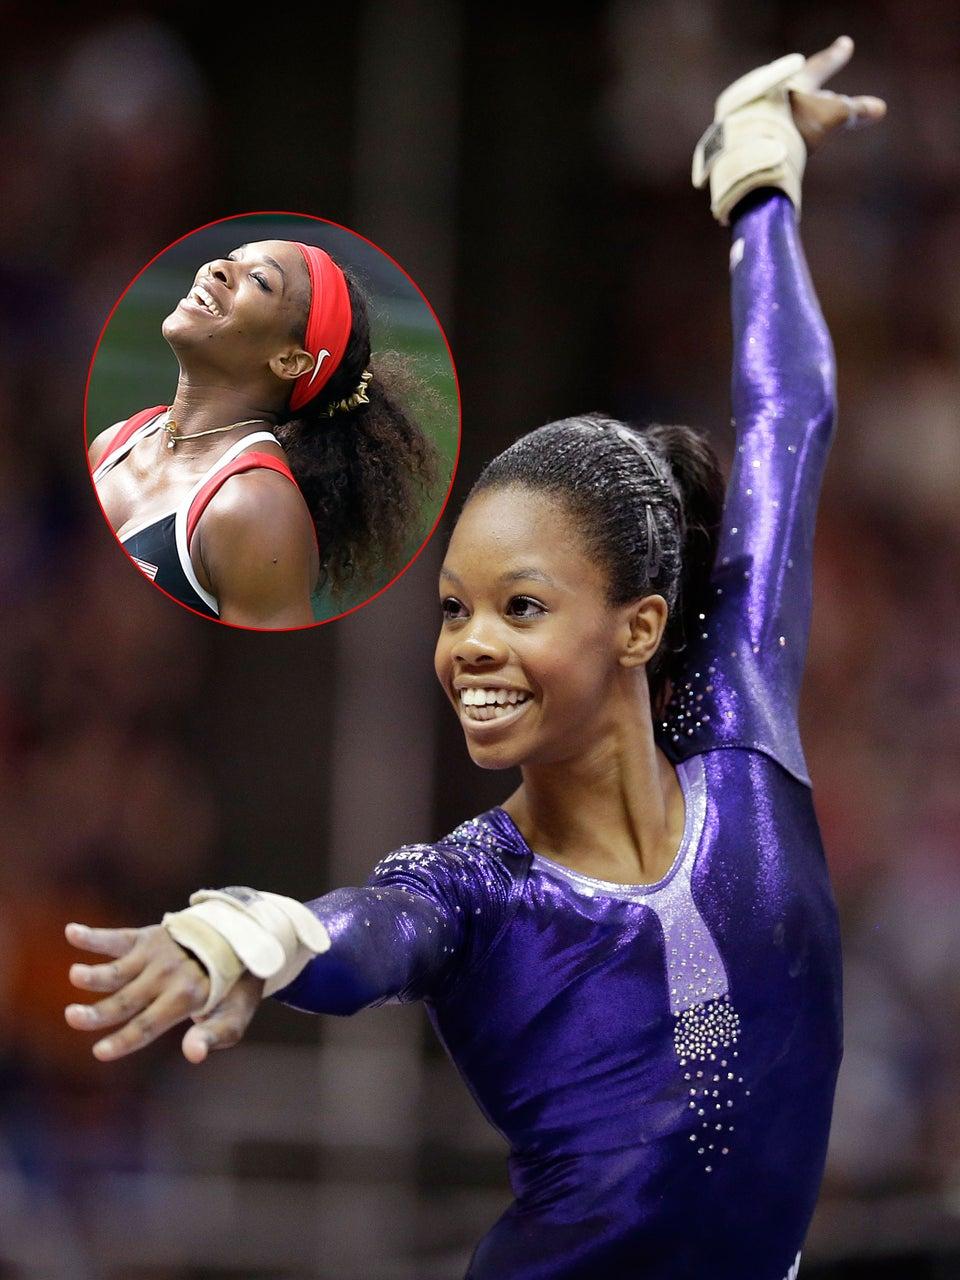 Olympics Update: Gabby Douglas Advances to All-Around, Serena Williams Wins 1st Round Match